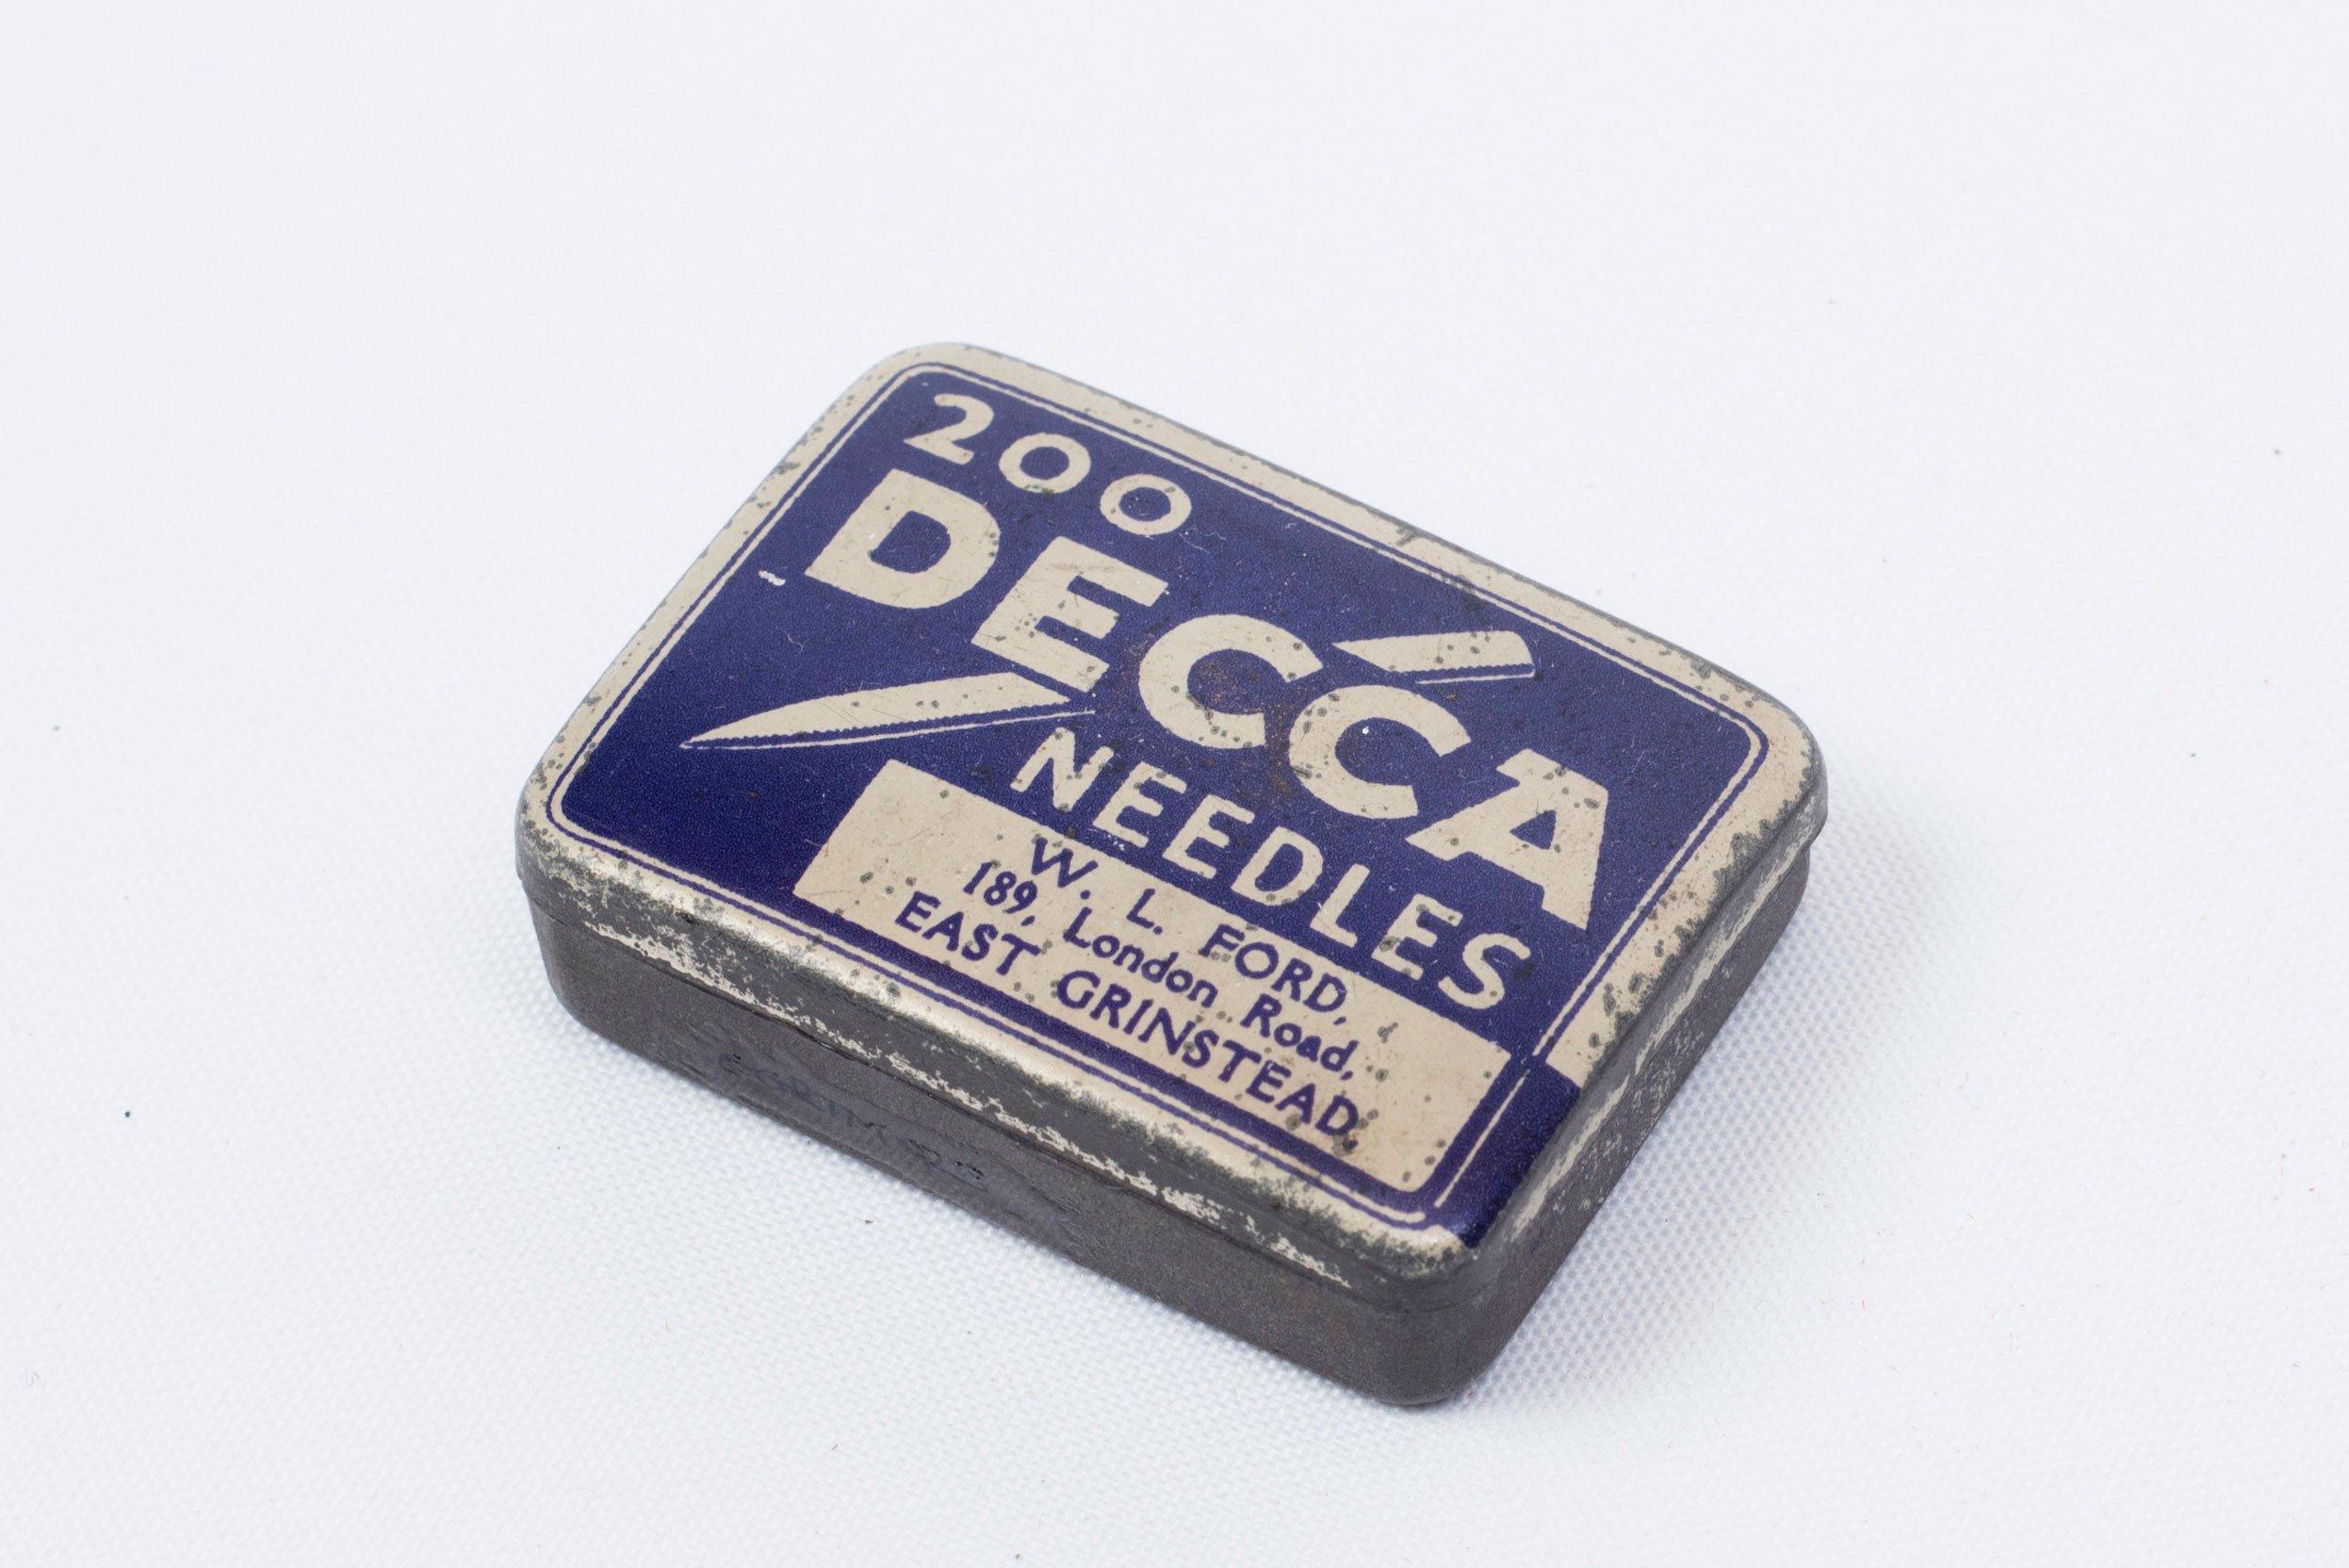 200 DECCA Gramophone Needles – East Grinstead Museum